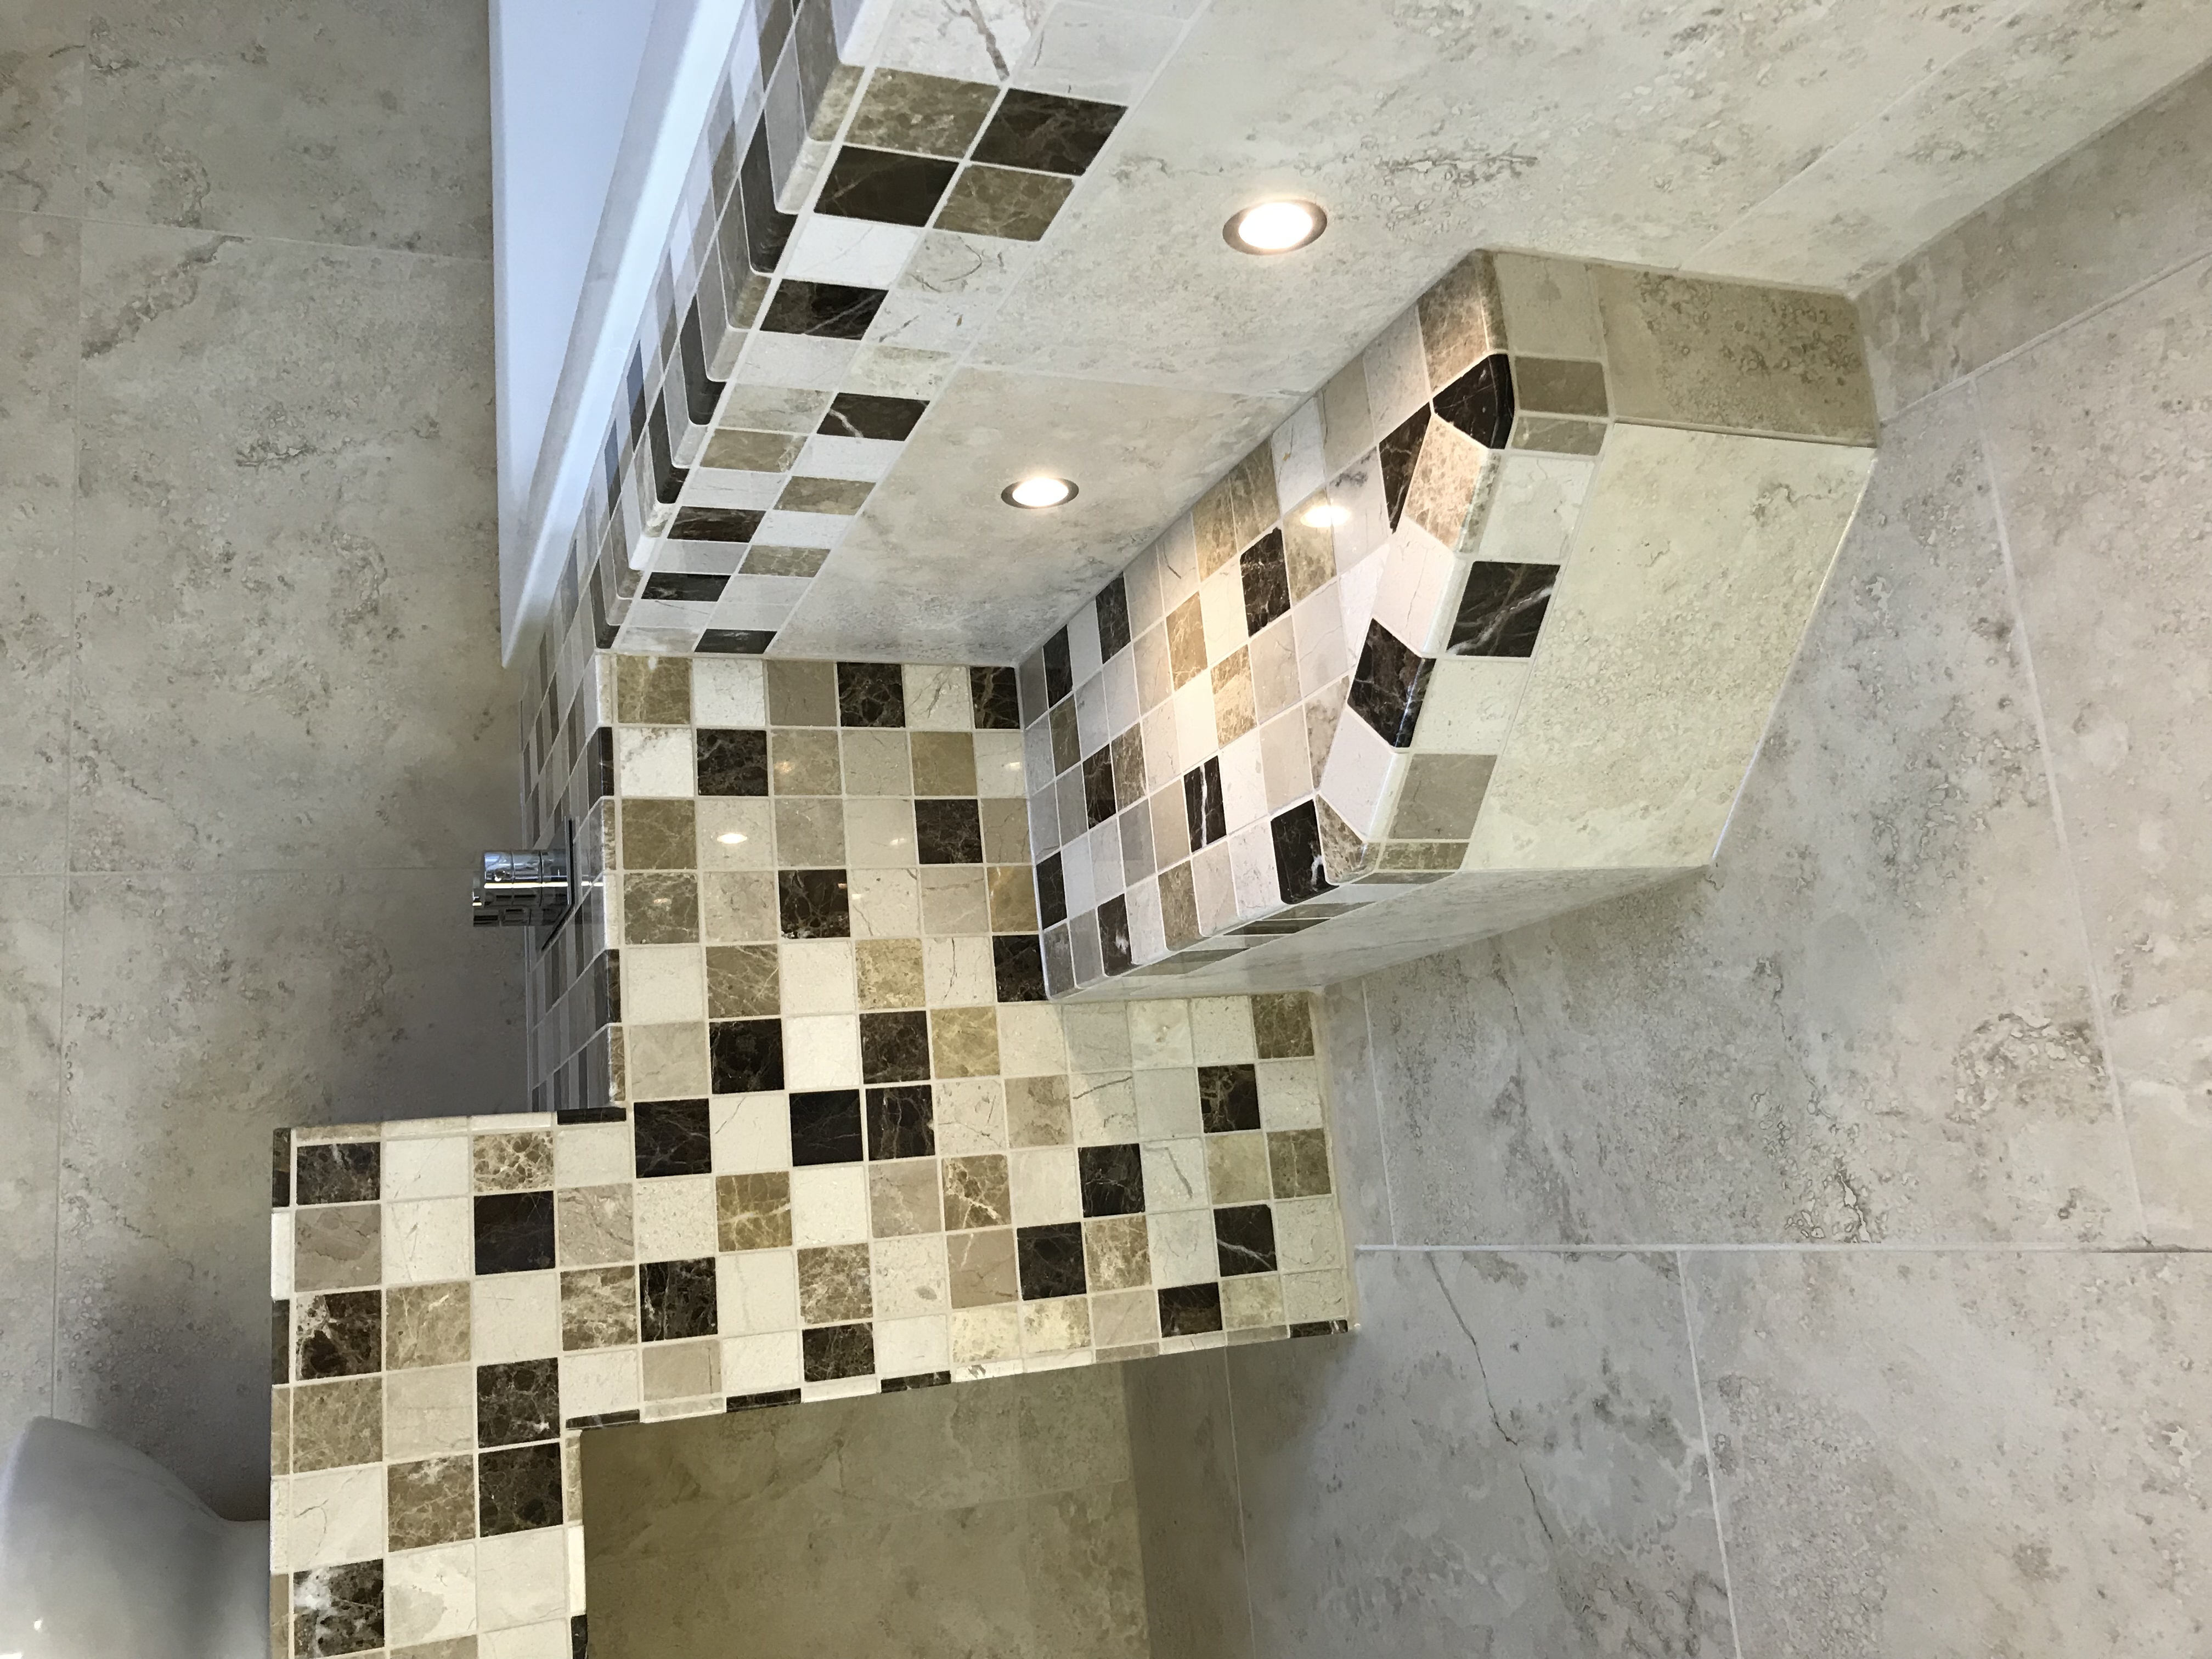 Stone mosaic tiles in bathroom